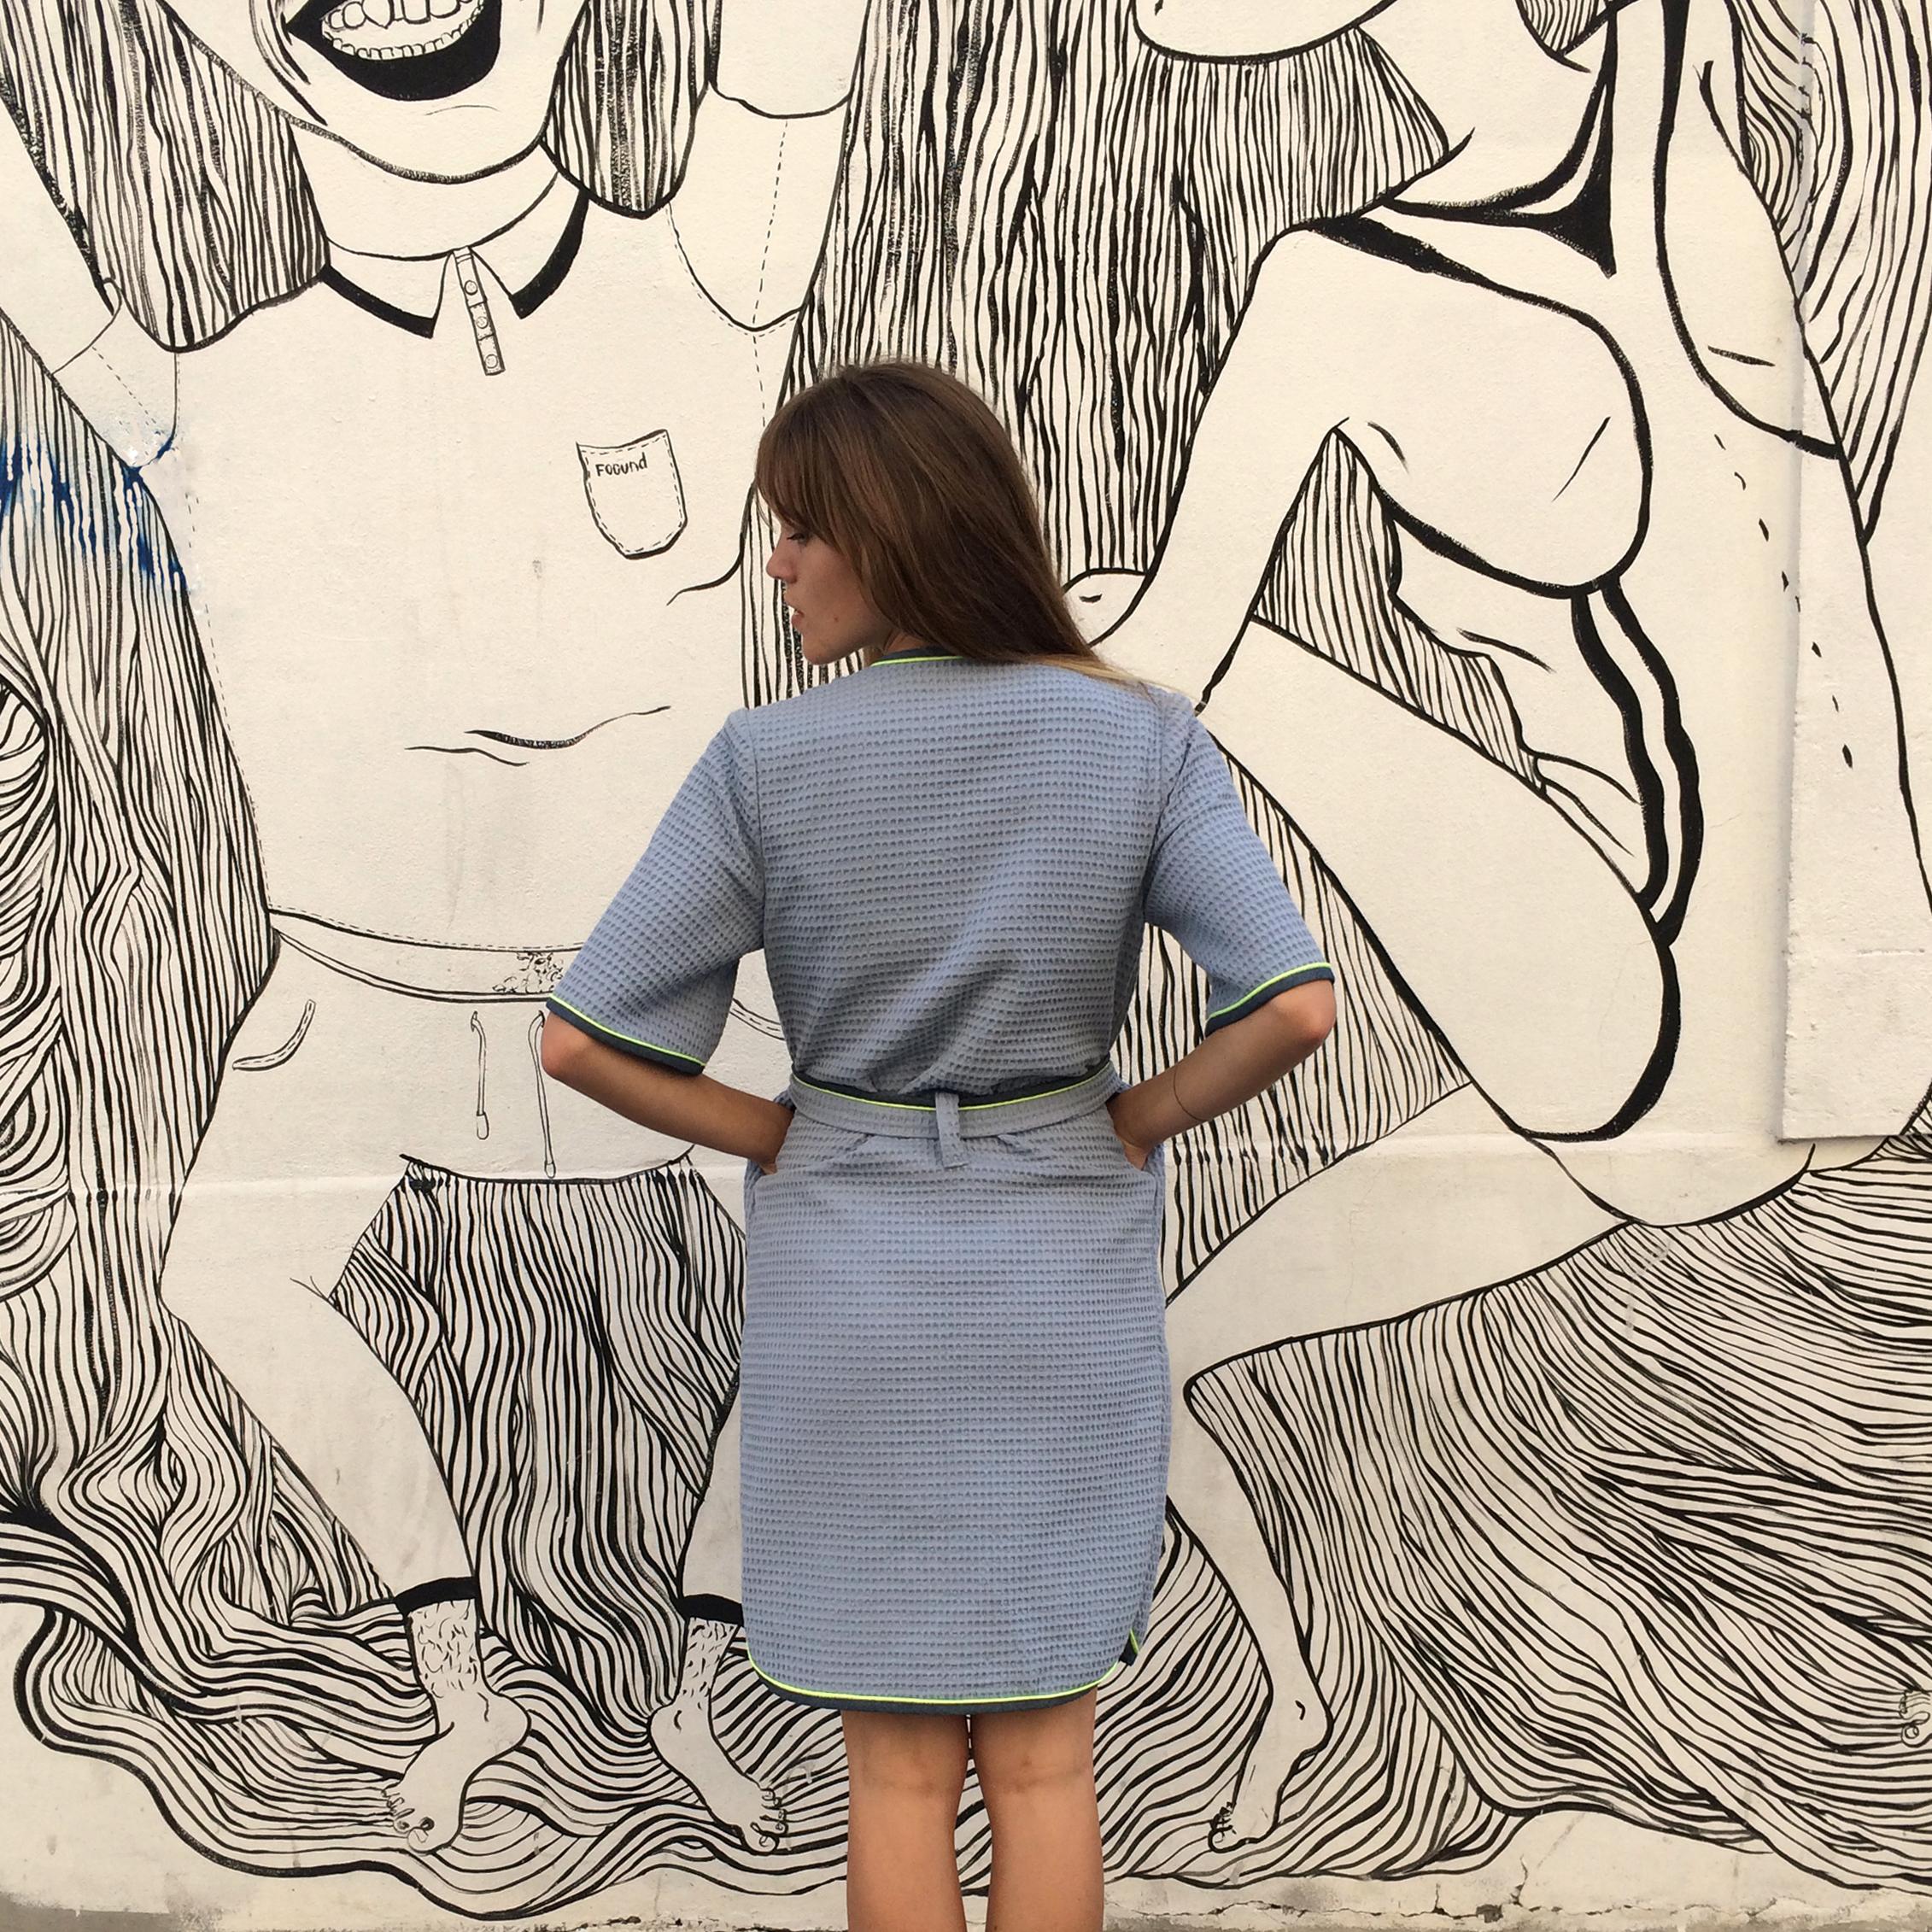 Patron de couture - Peignoir robe de chambre Hérens